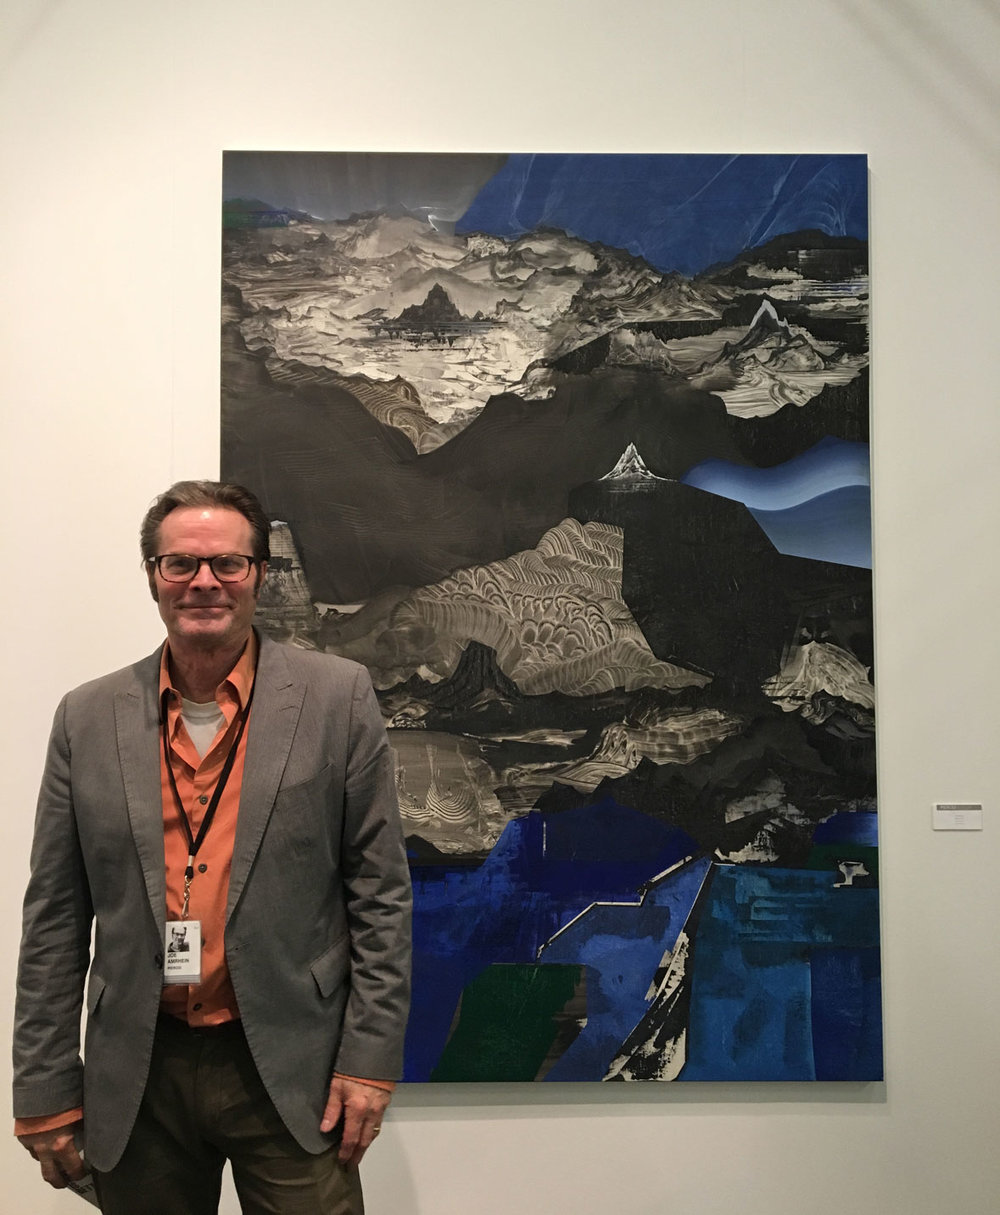 Joe Amrhein of Pierogi Gallery in front of  Sleeper , 2017, by Elliott Green, Oil on linen, Pierogi Gallery, New York, NY